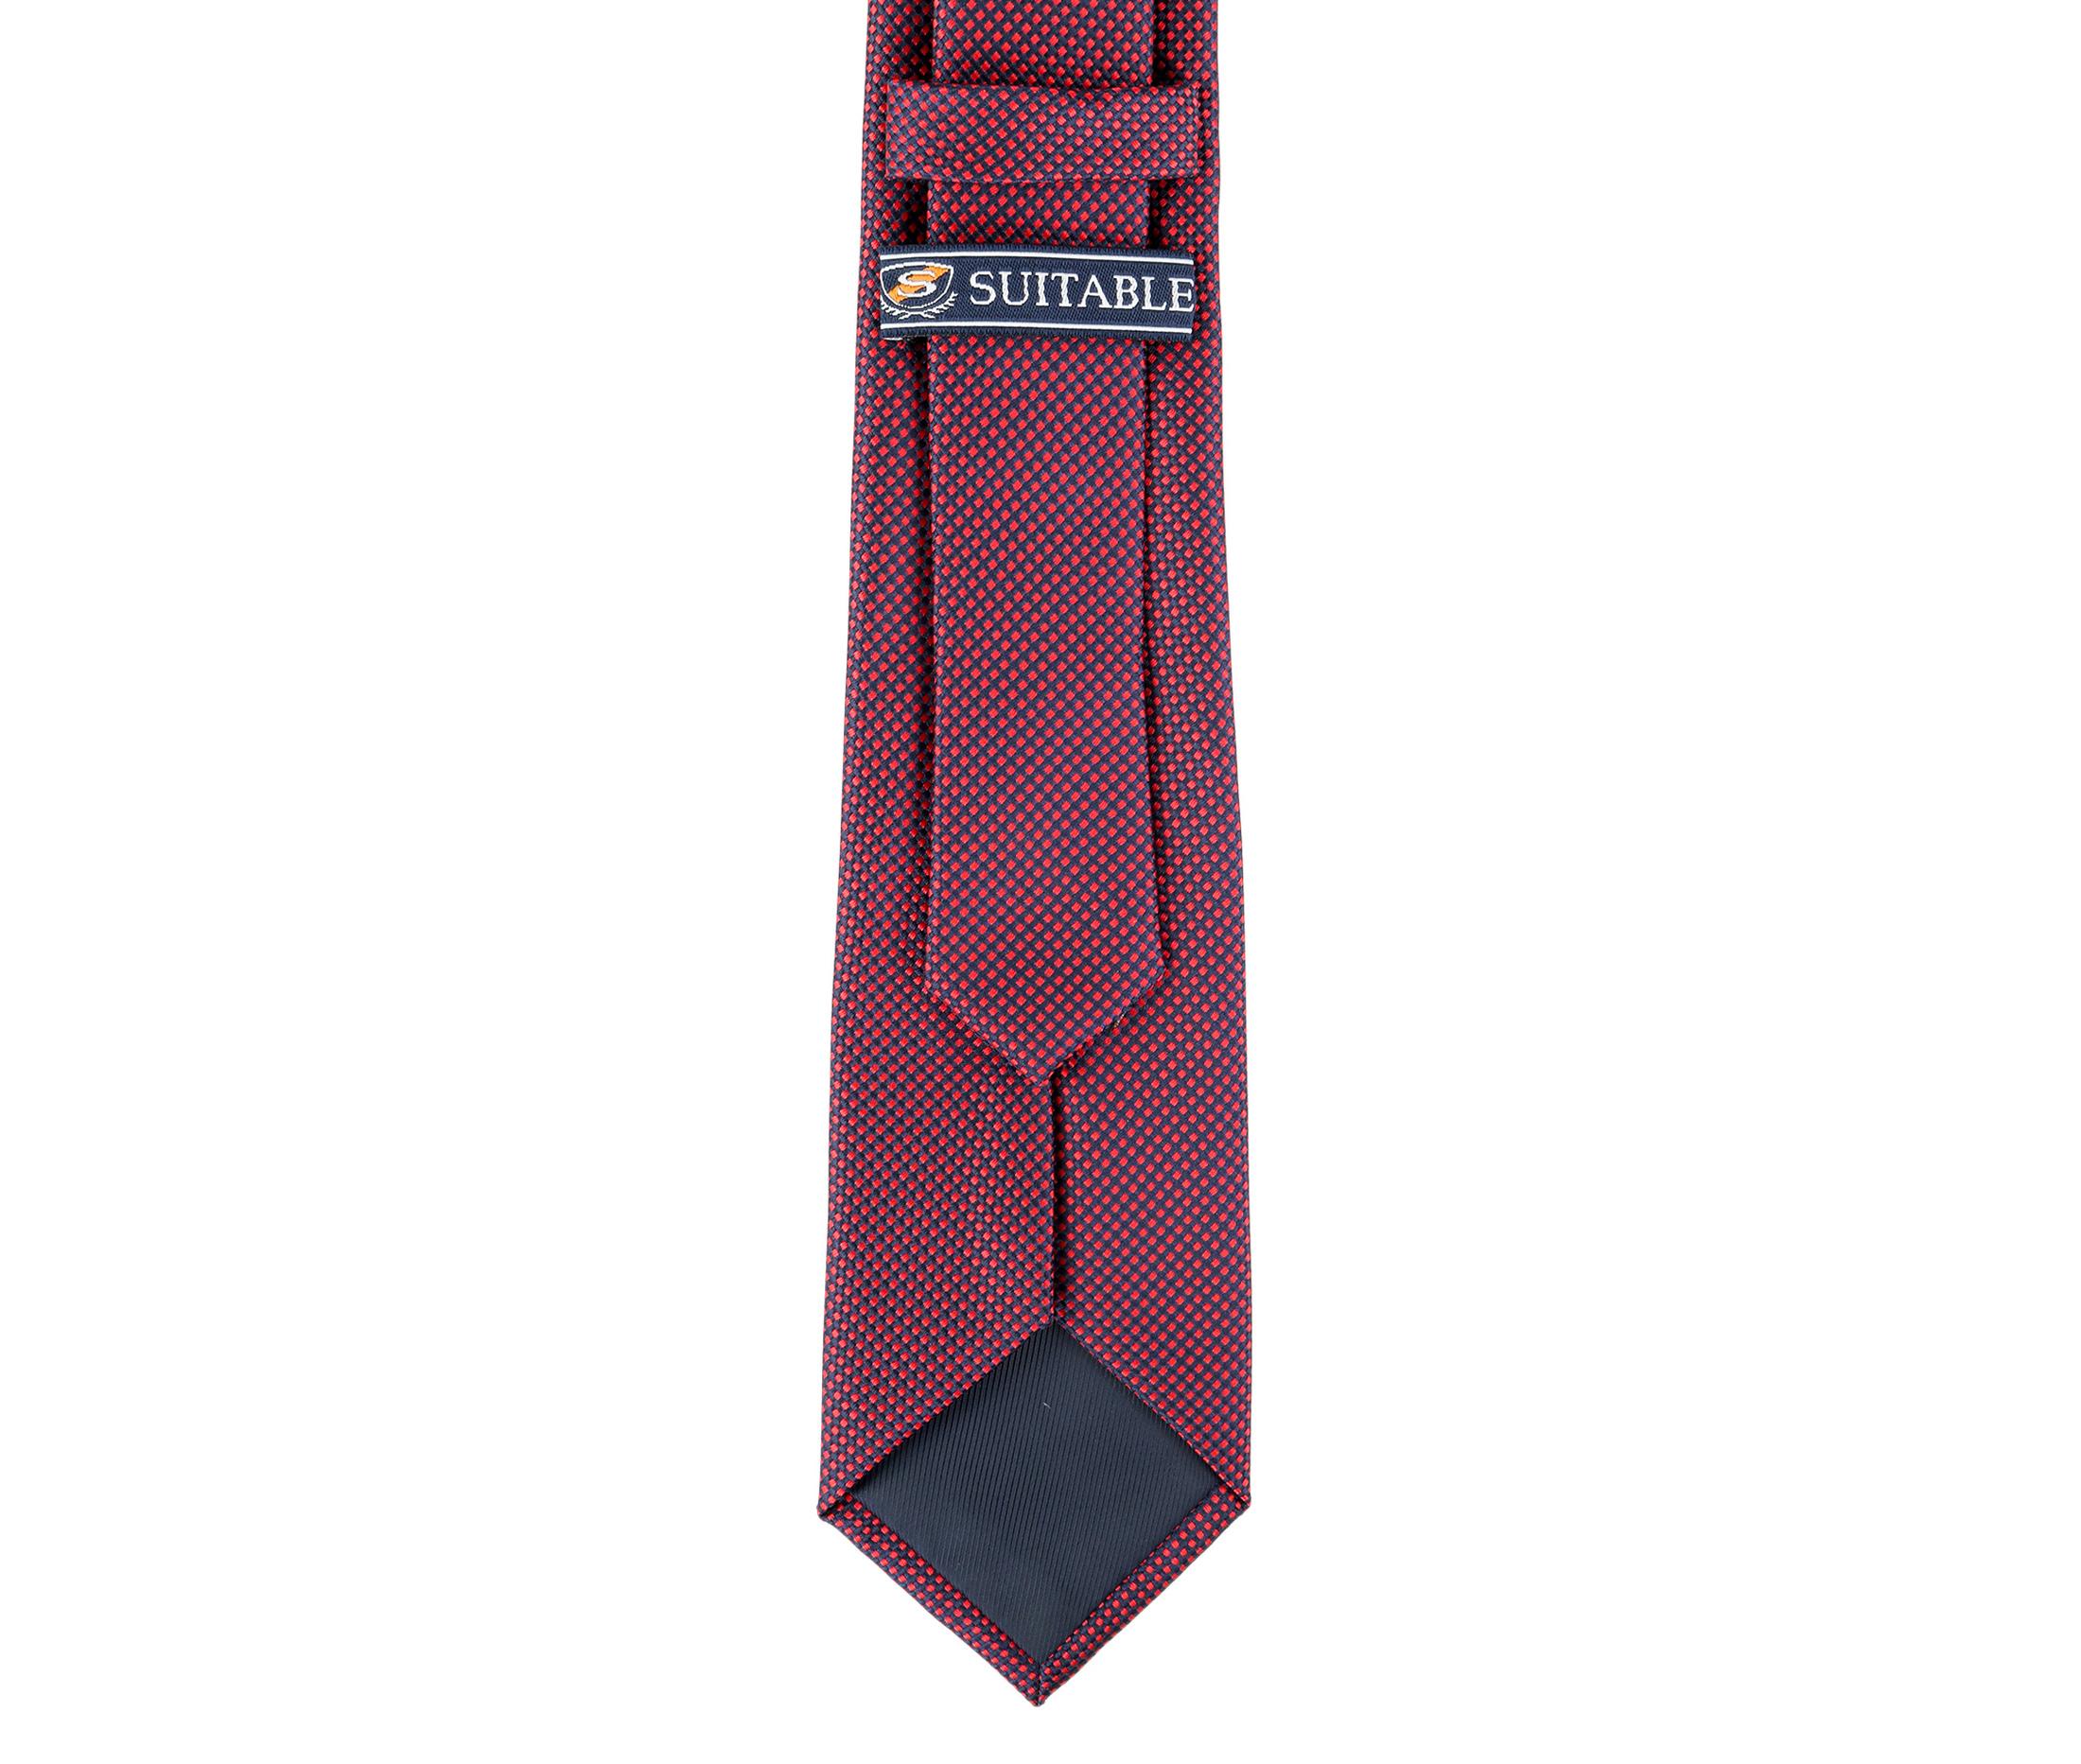 Krawatte Seide Karo Rot 9-17 foto 3